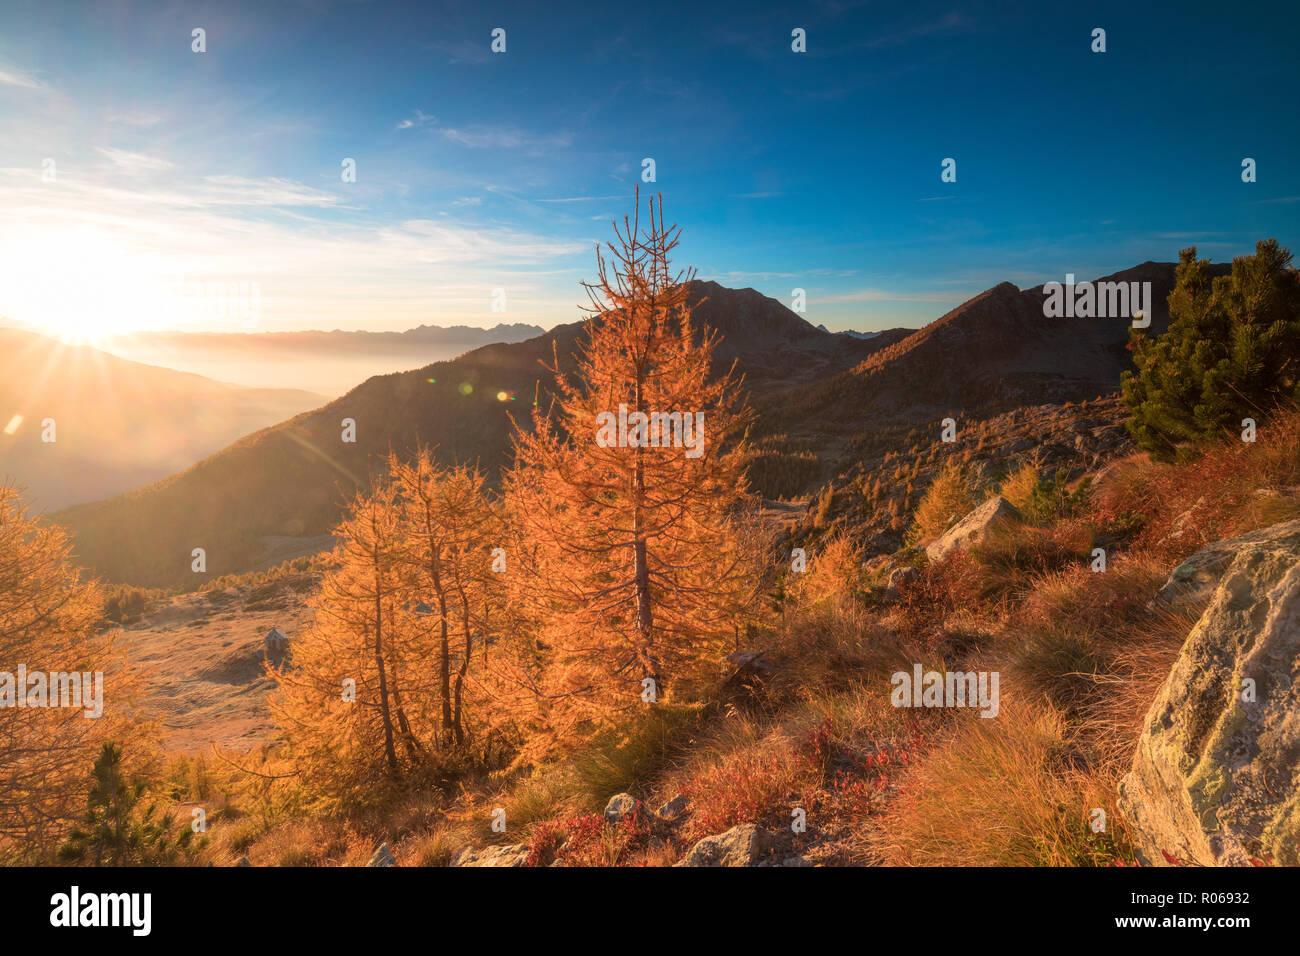 Sunburst on colorful larches during fall season, Alpe Arcoglio Valmalenco, Valtellina, Lombardy, Italy, Europe Stock Photo